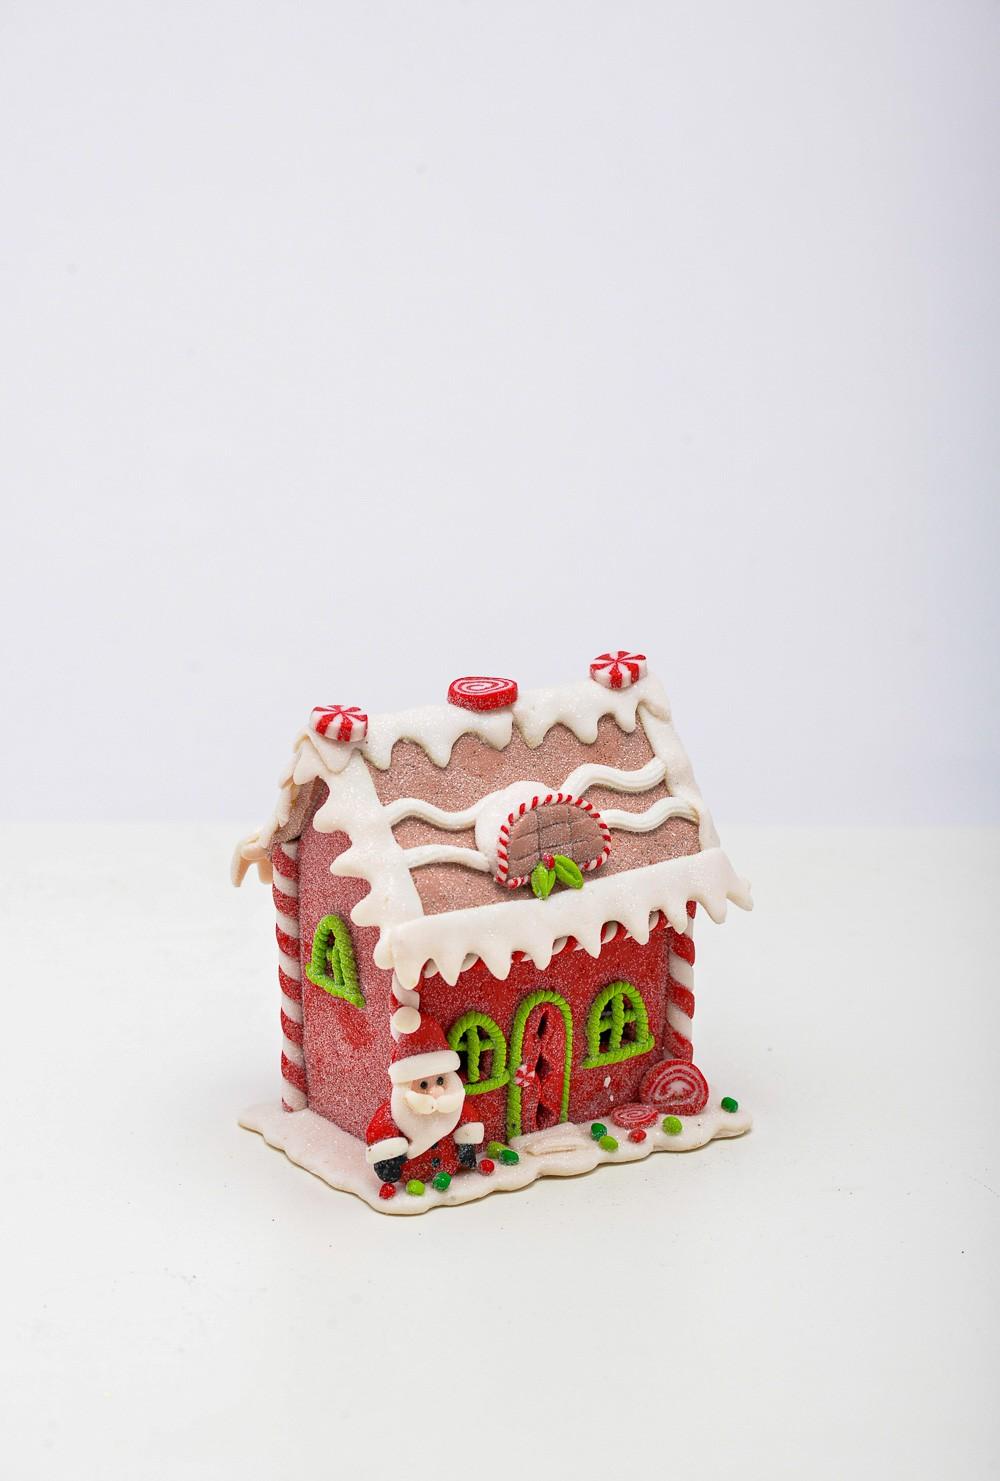 Casinha Natalina De Bisqui com Led  Papai Noel